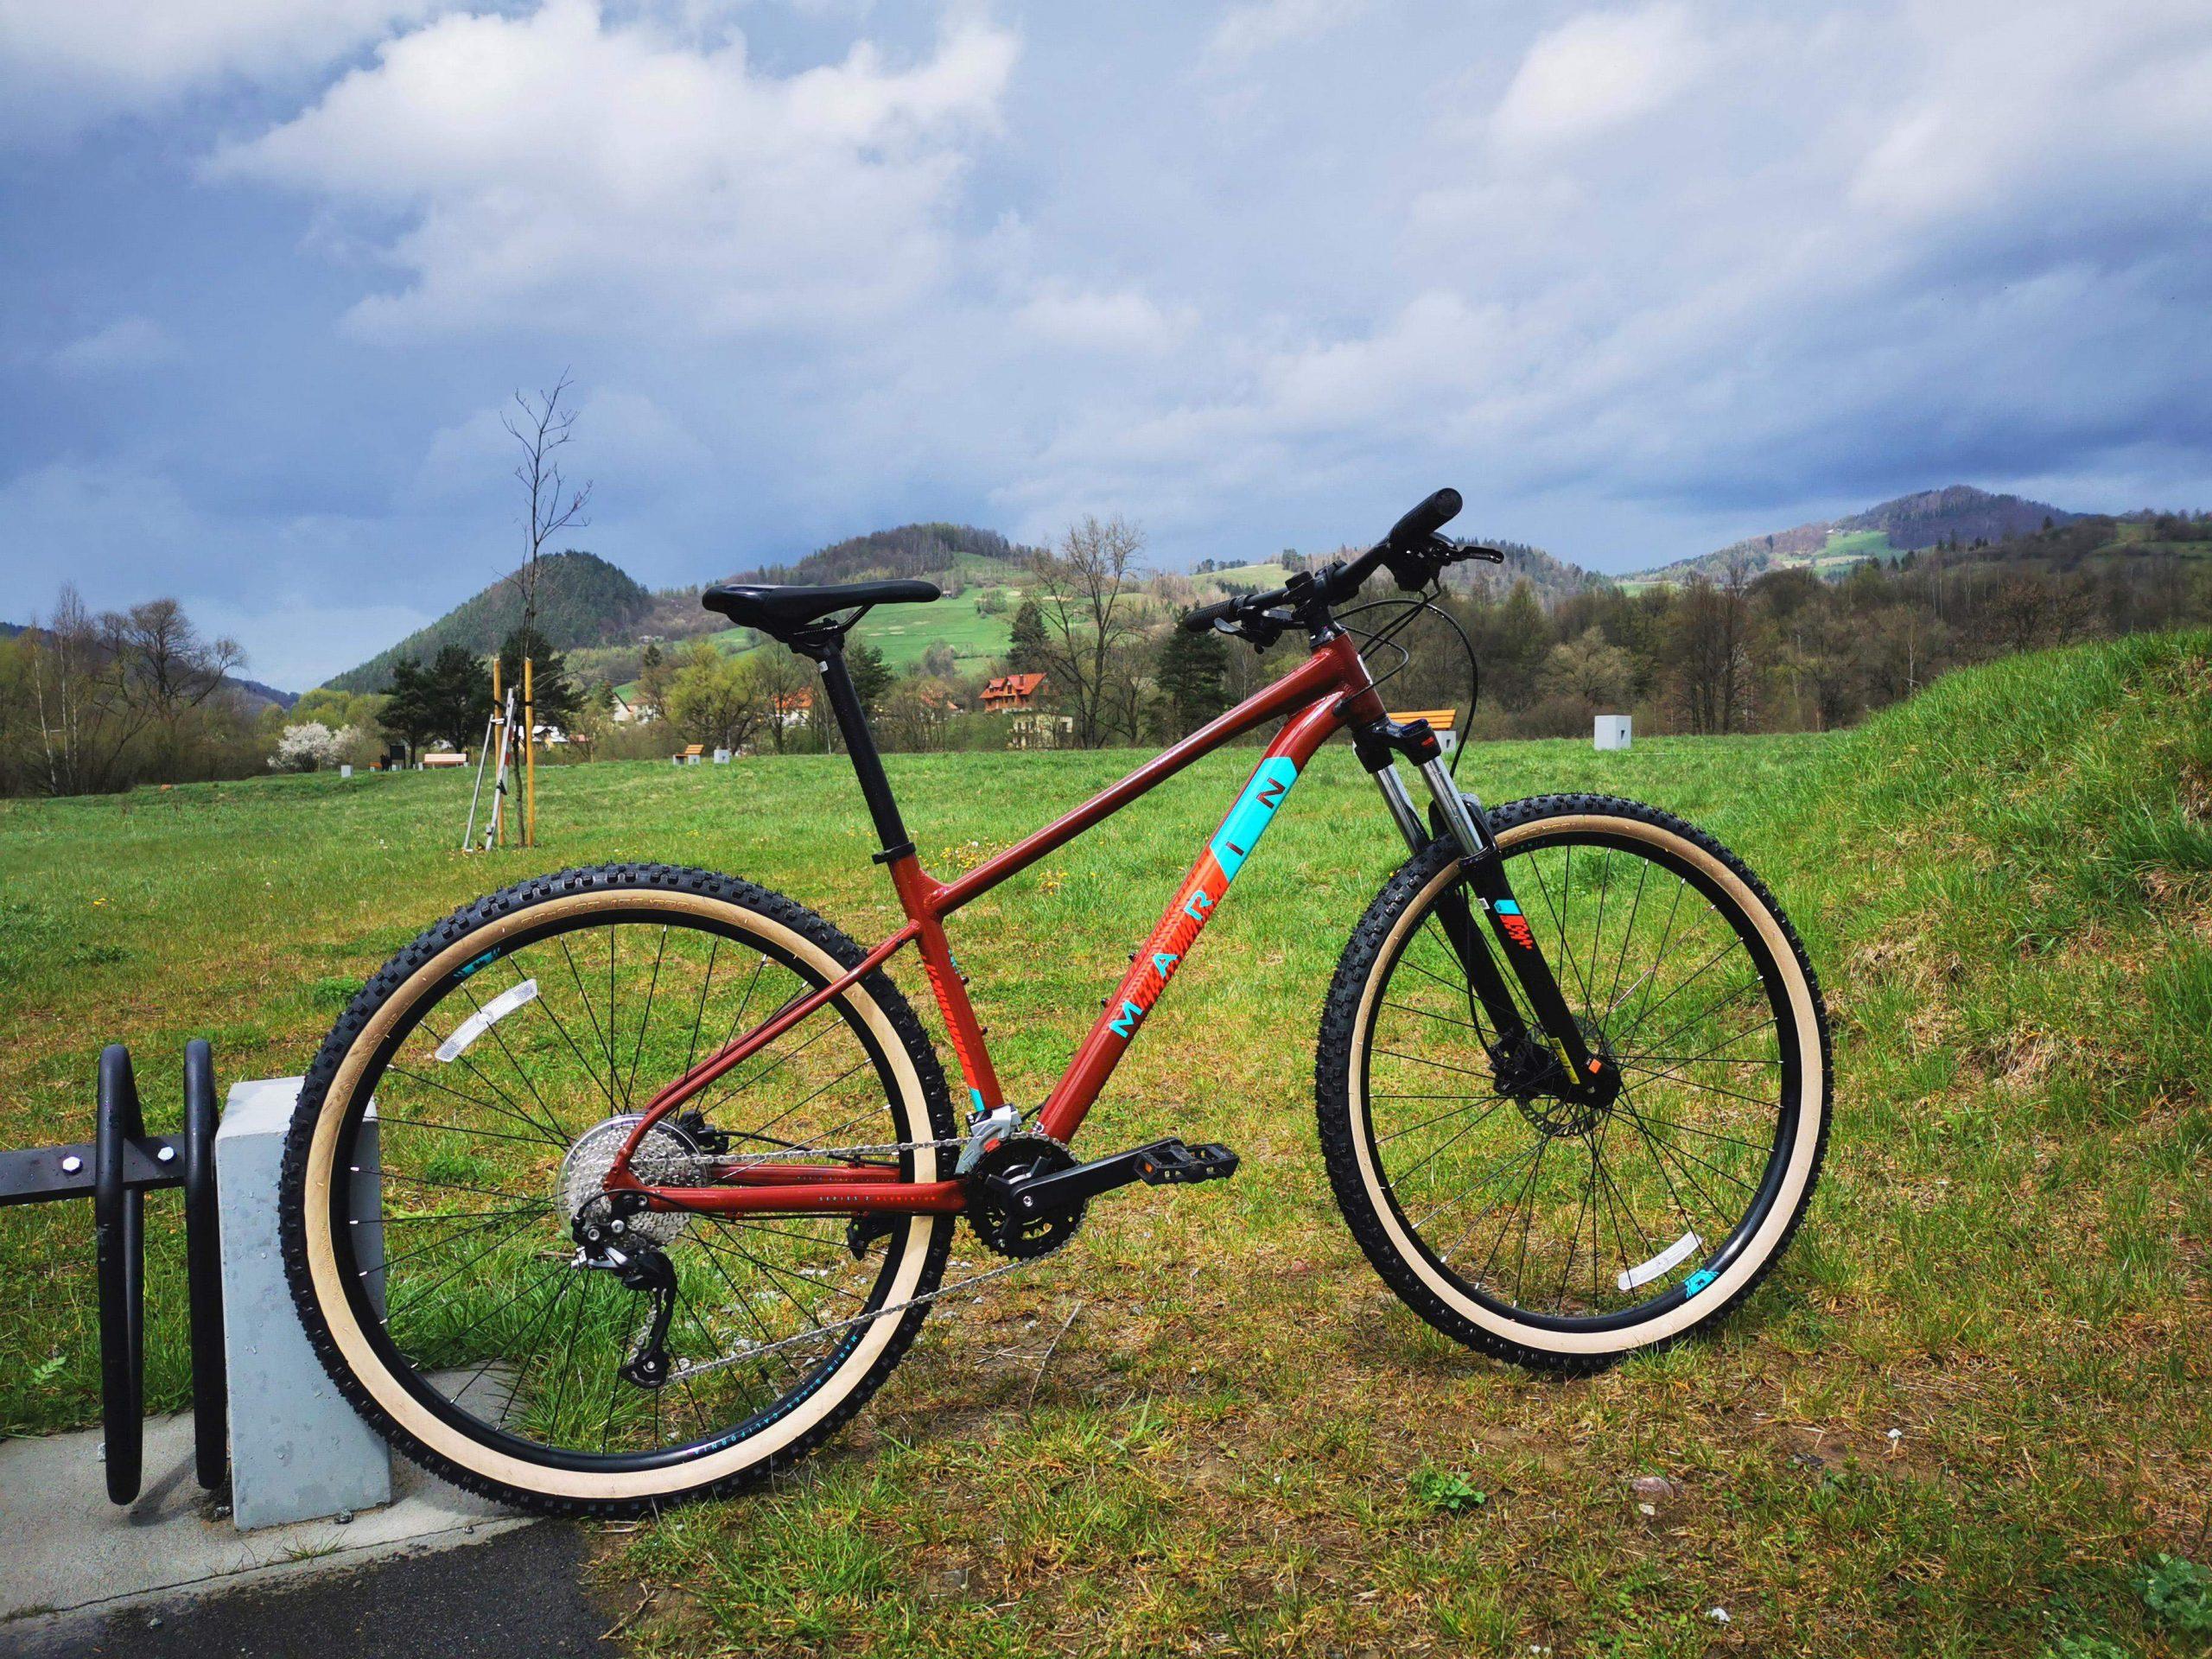 Marin bobcat trail rower rowery motor-land